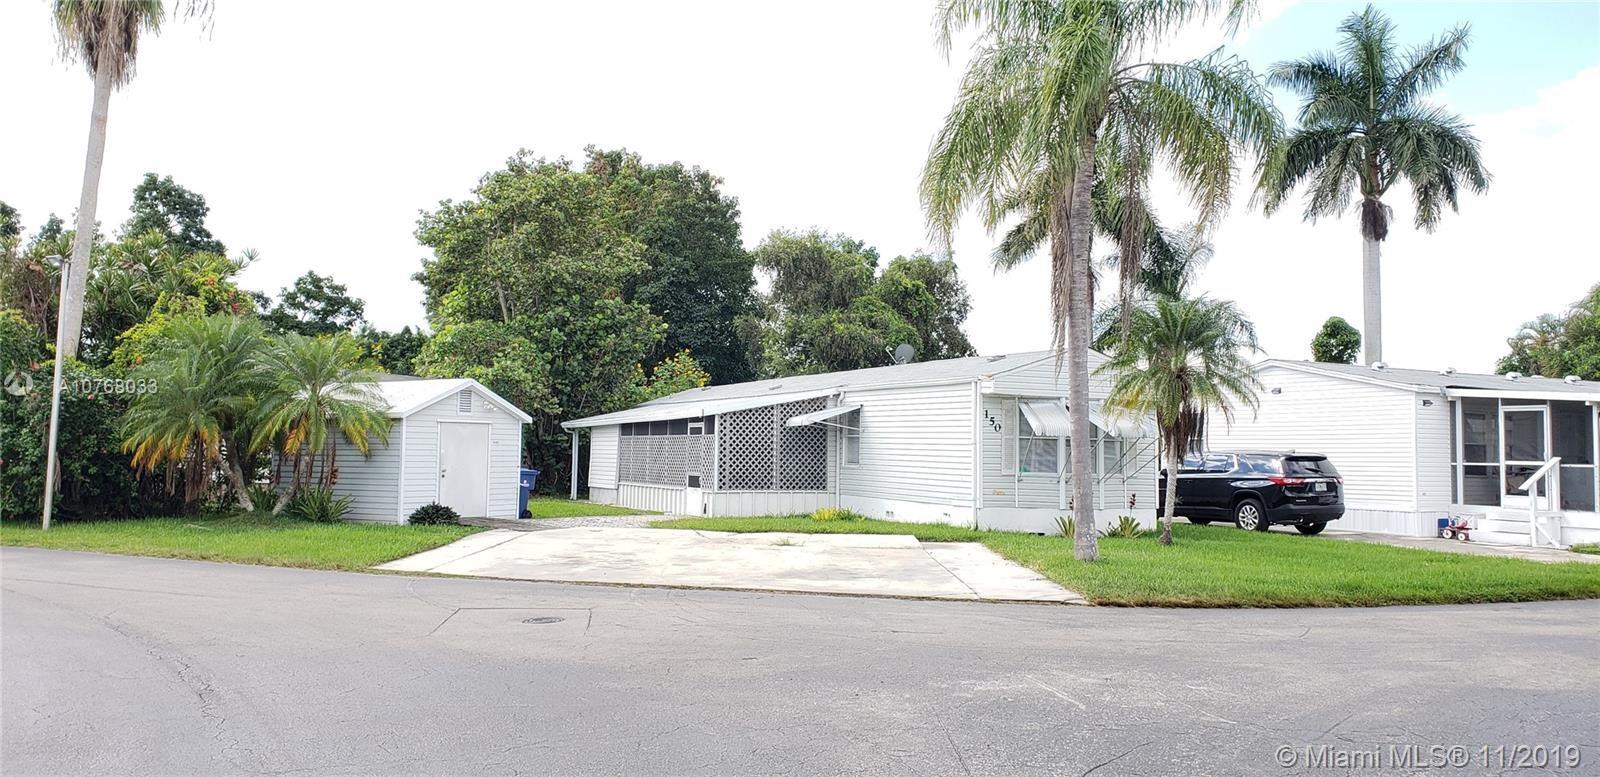 35250 SW 177th Ct #150, Florida City, FL 33034 - Florida City, FL real estate listing